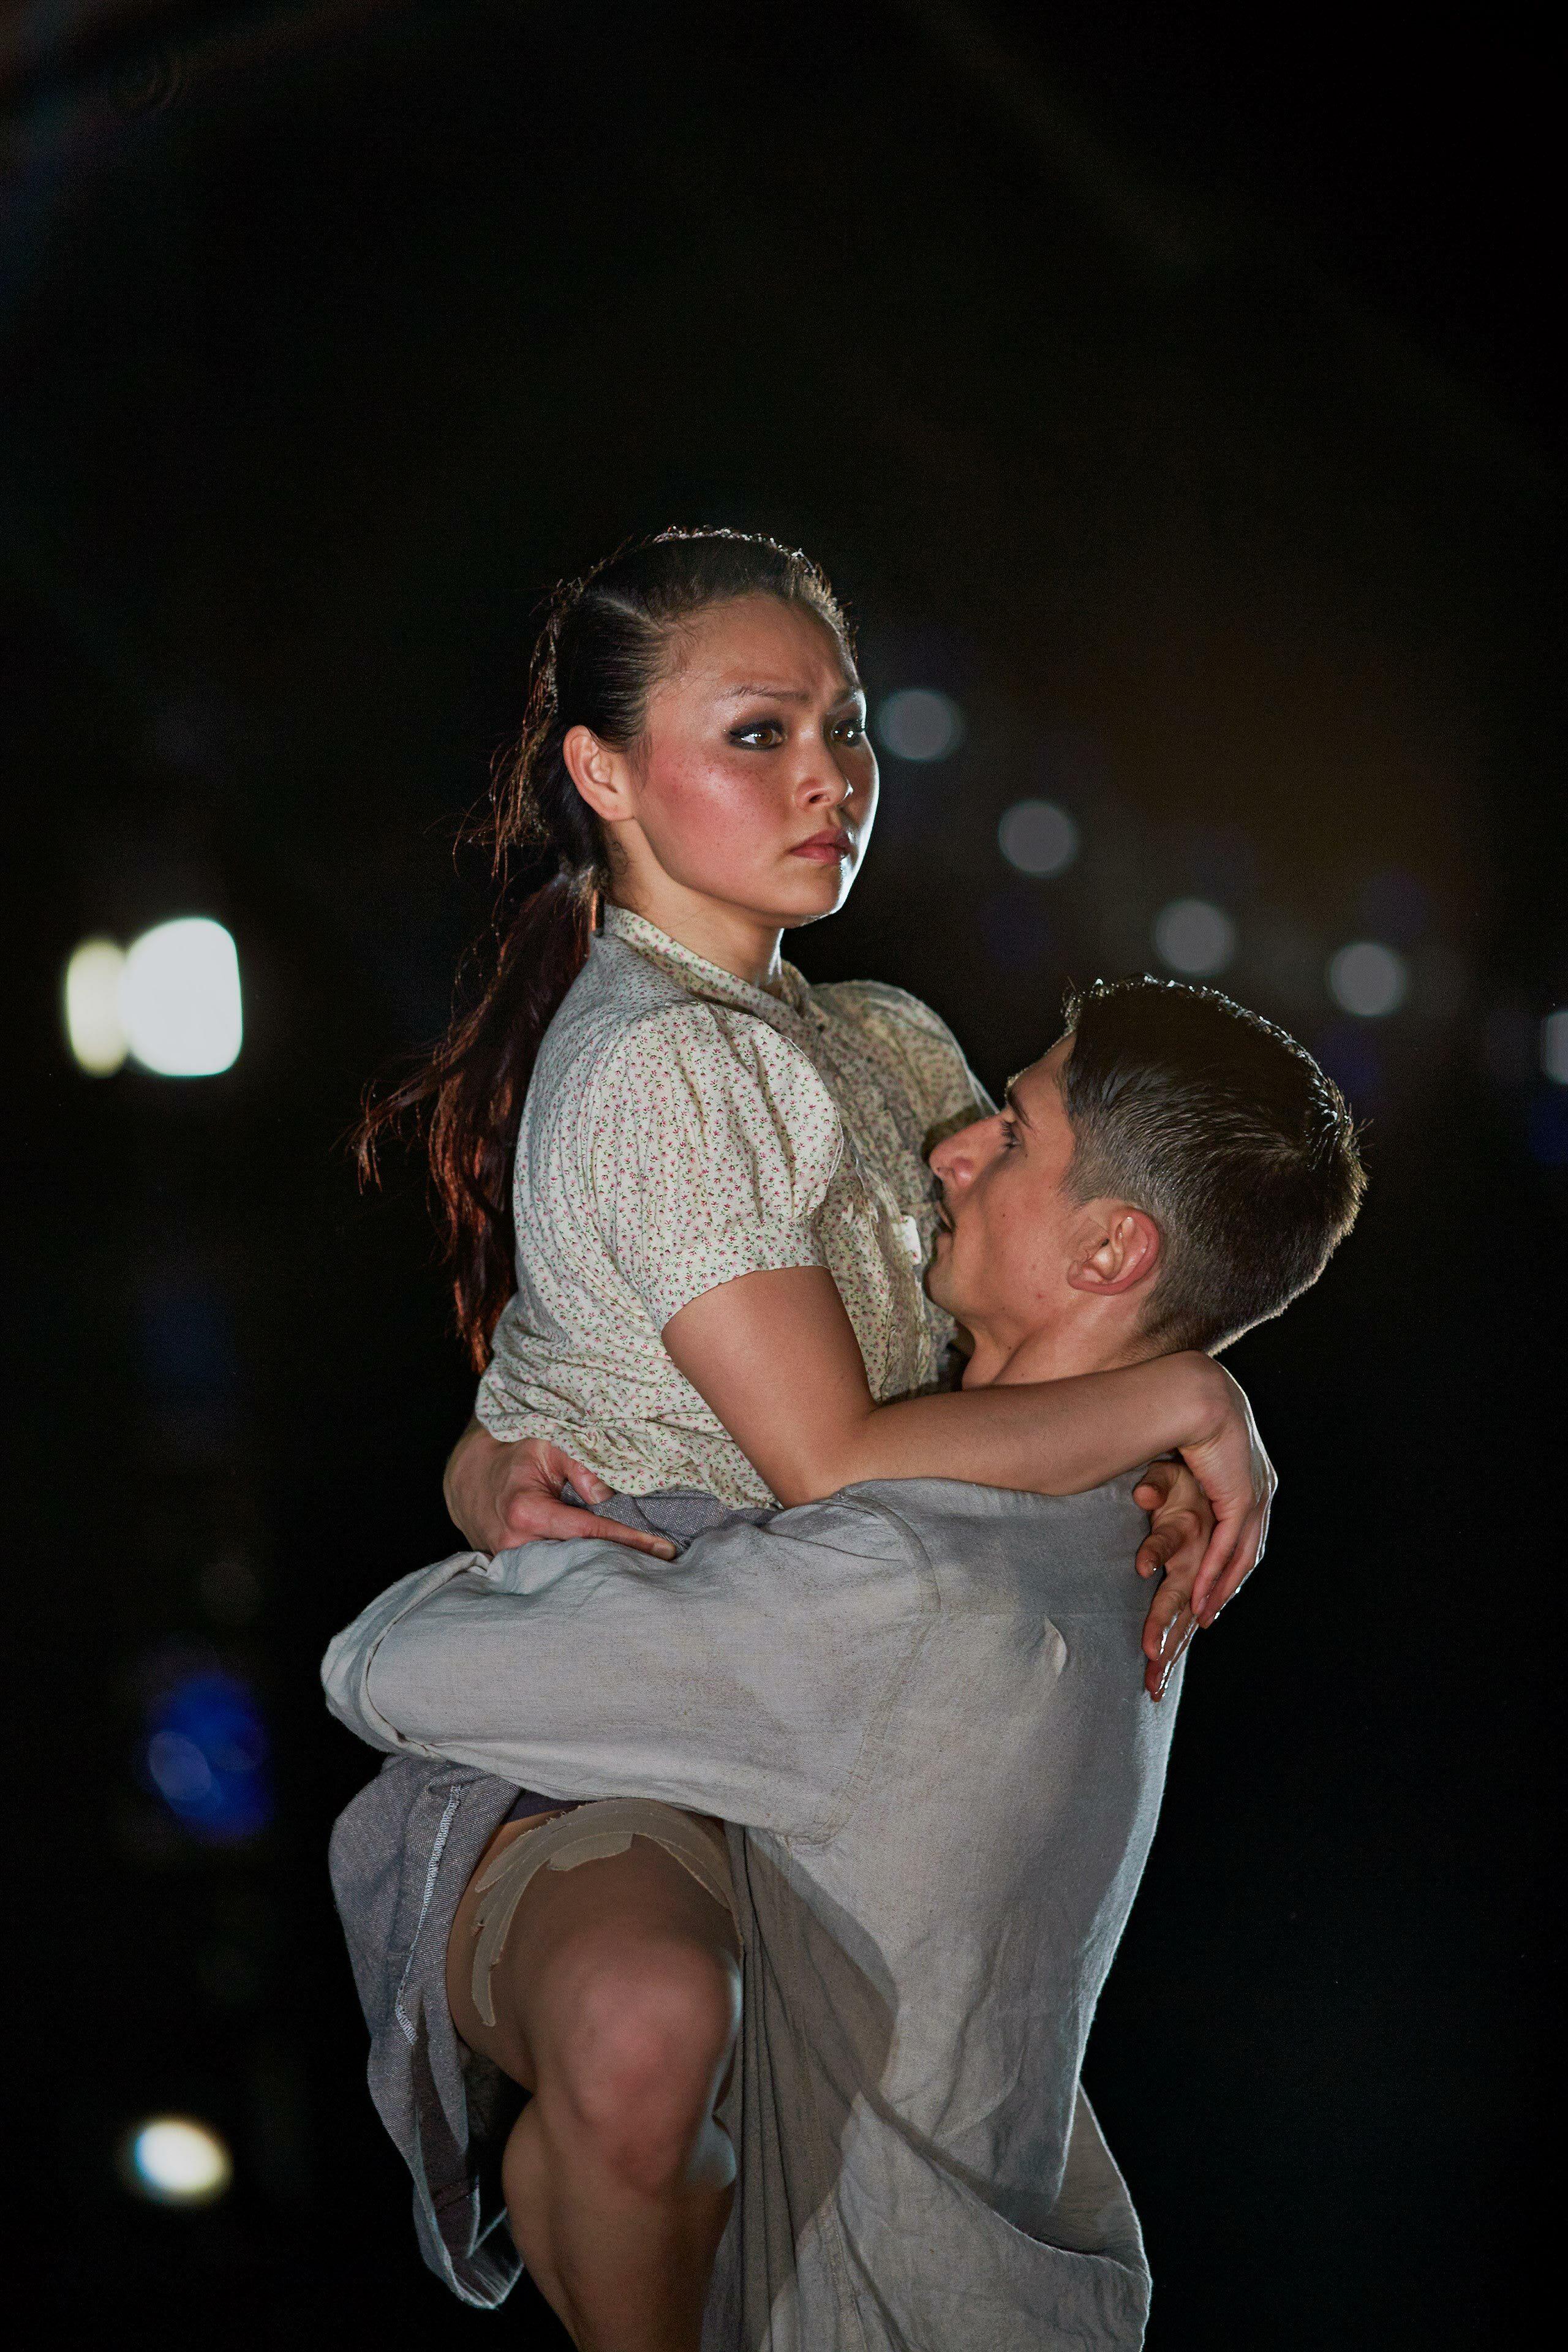 Richard Moran Dance Music Performance 010